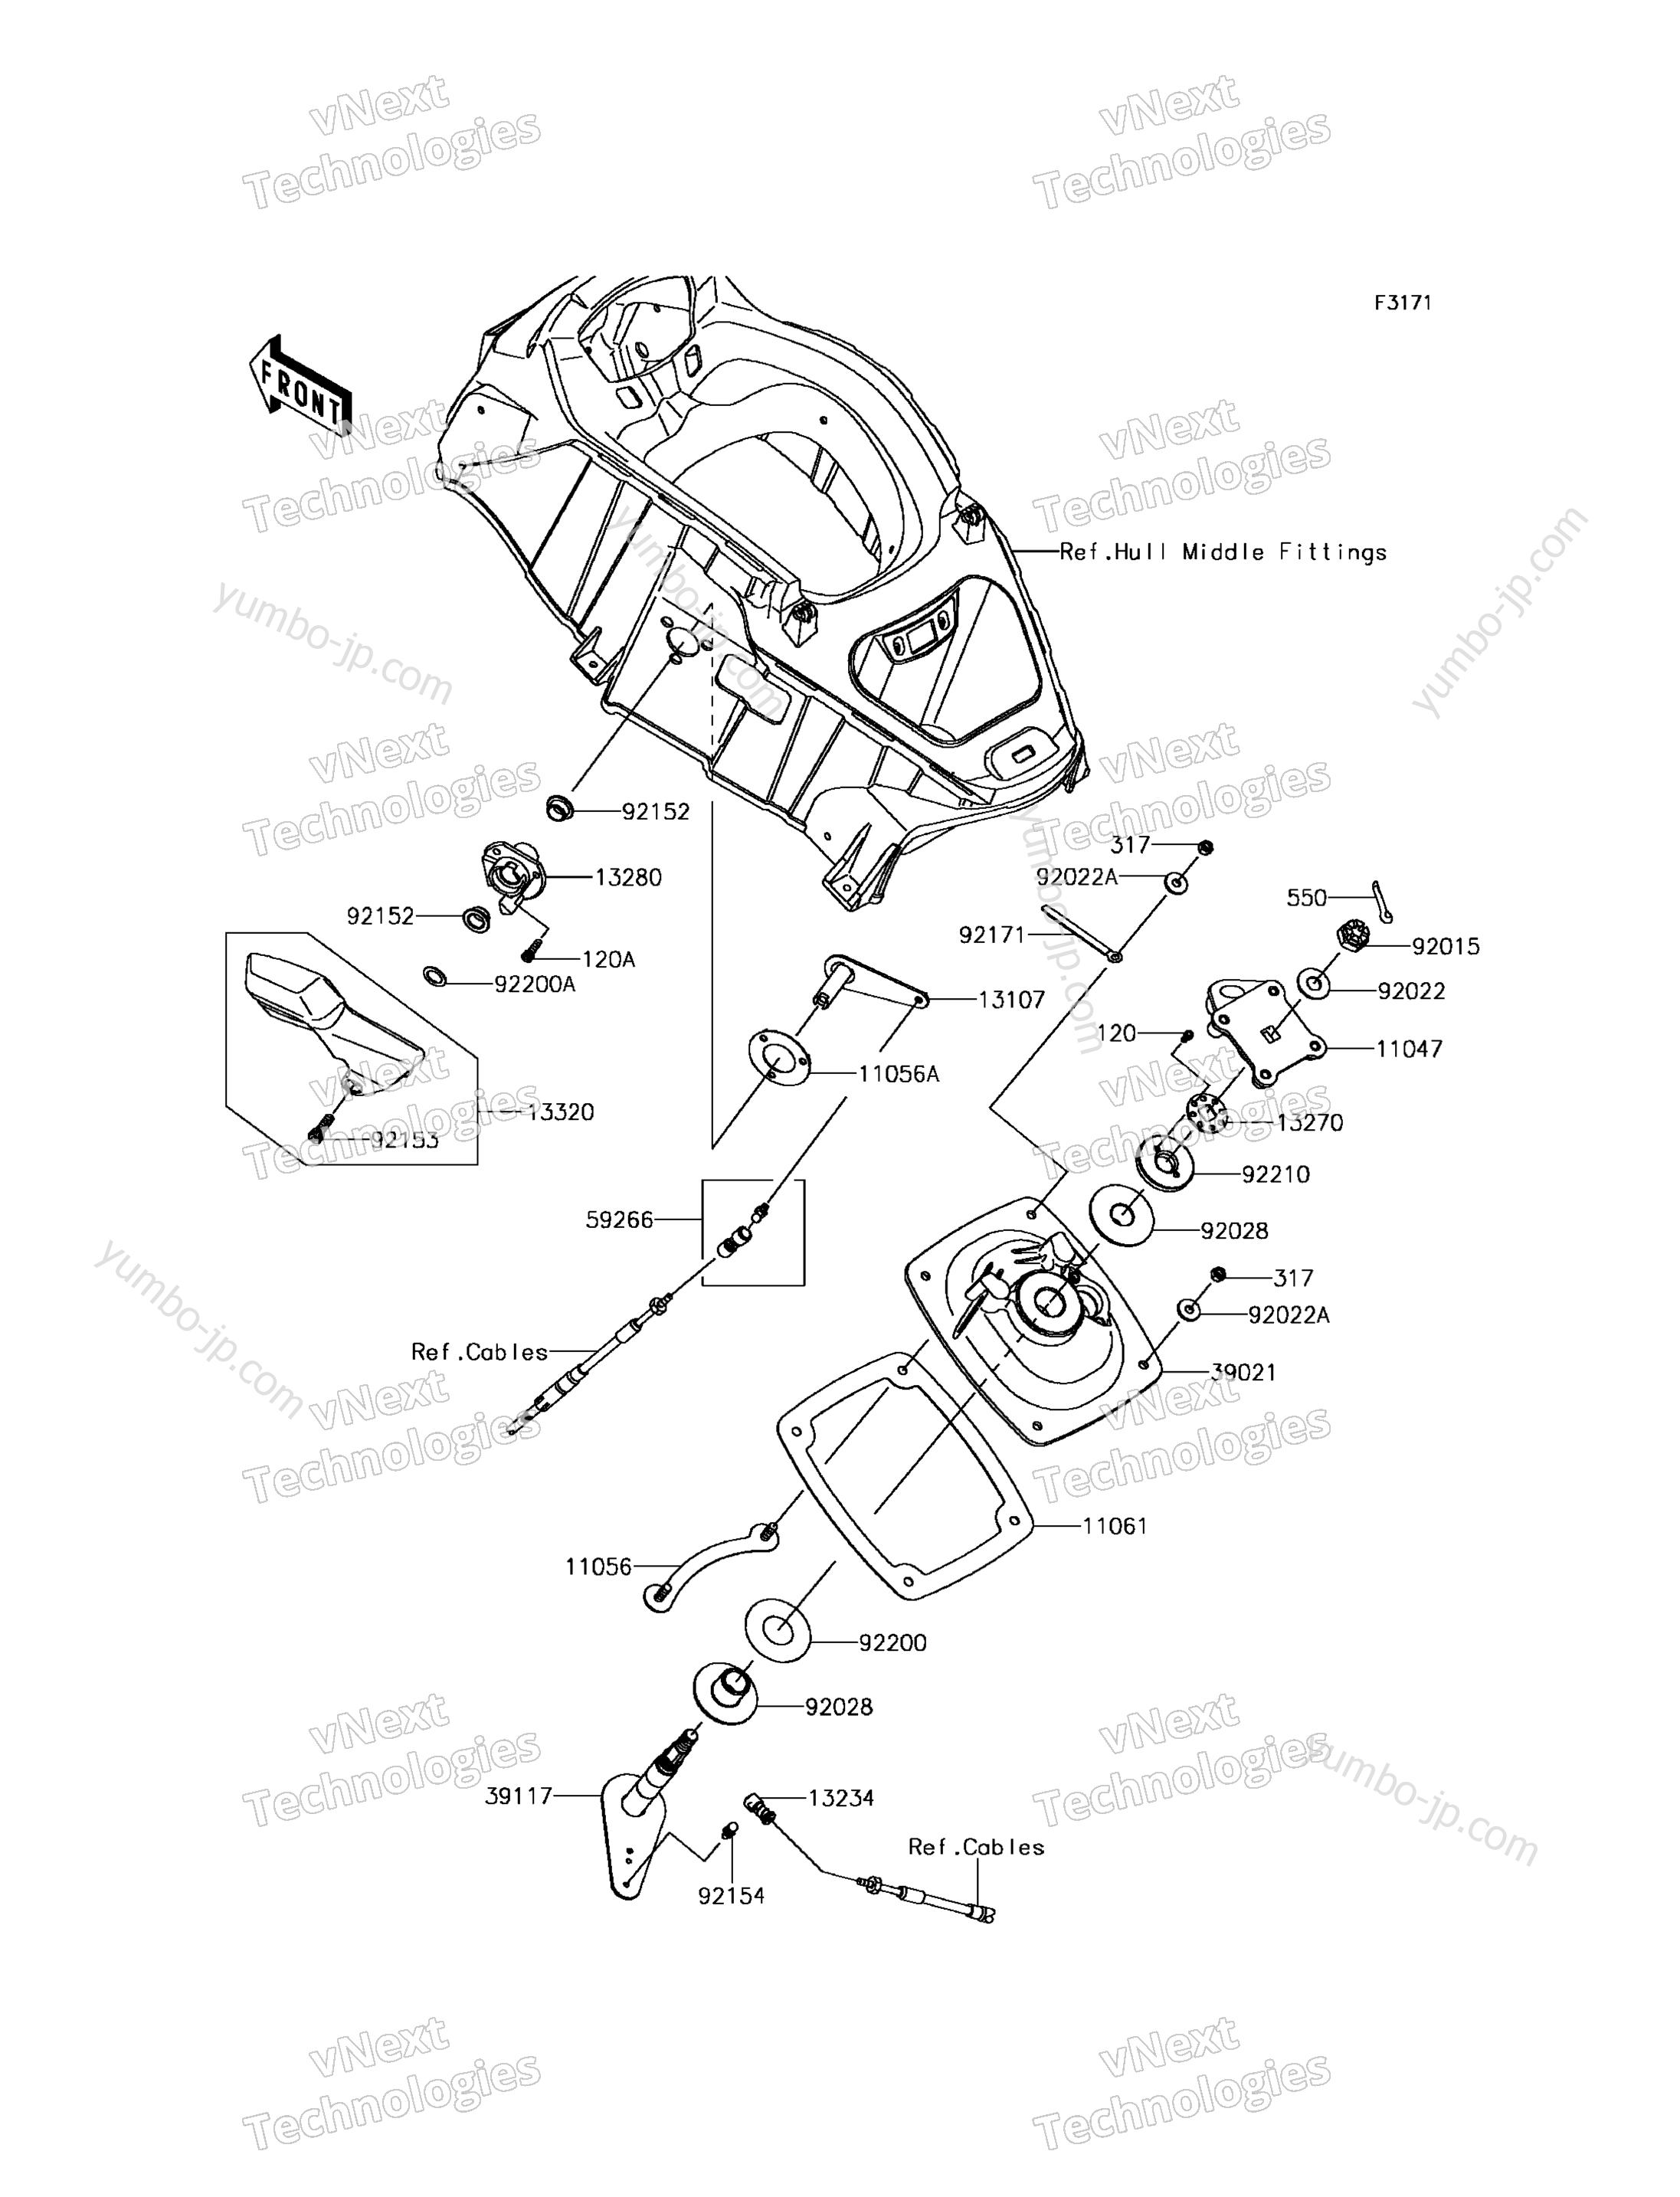 Handle Pole для гидроцикла KAWASAKI JET SKI ULTRA 310R (JT1500NGF) 2016 г.